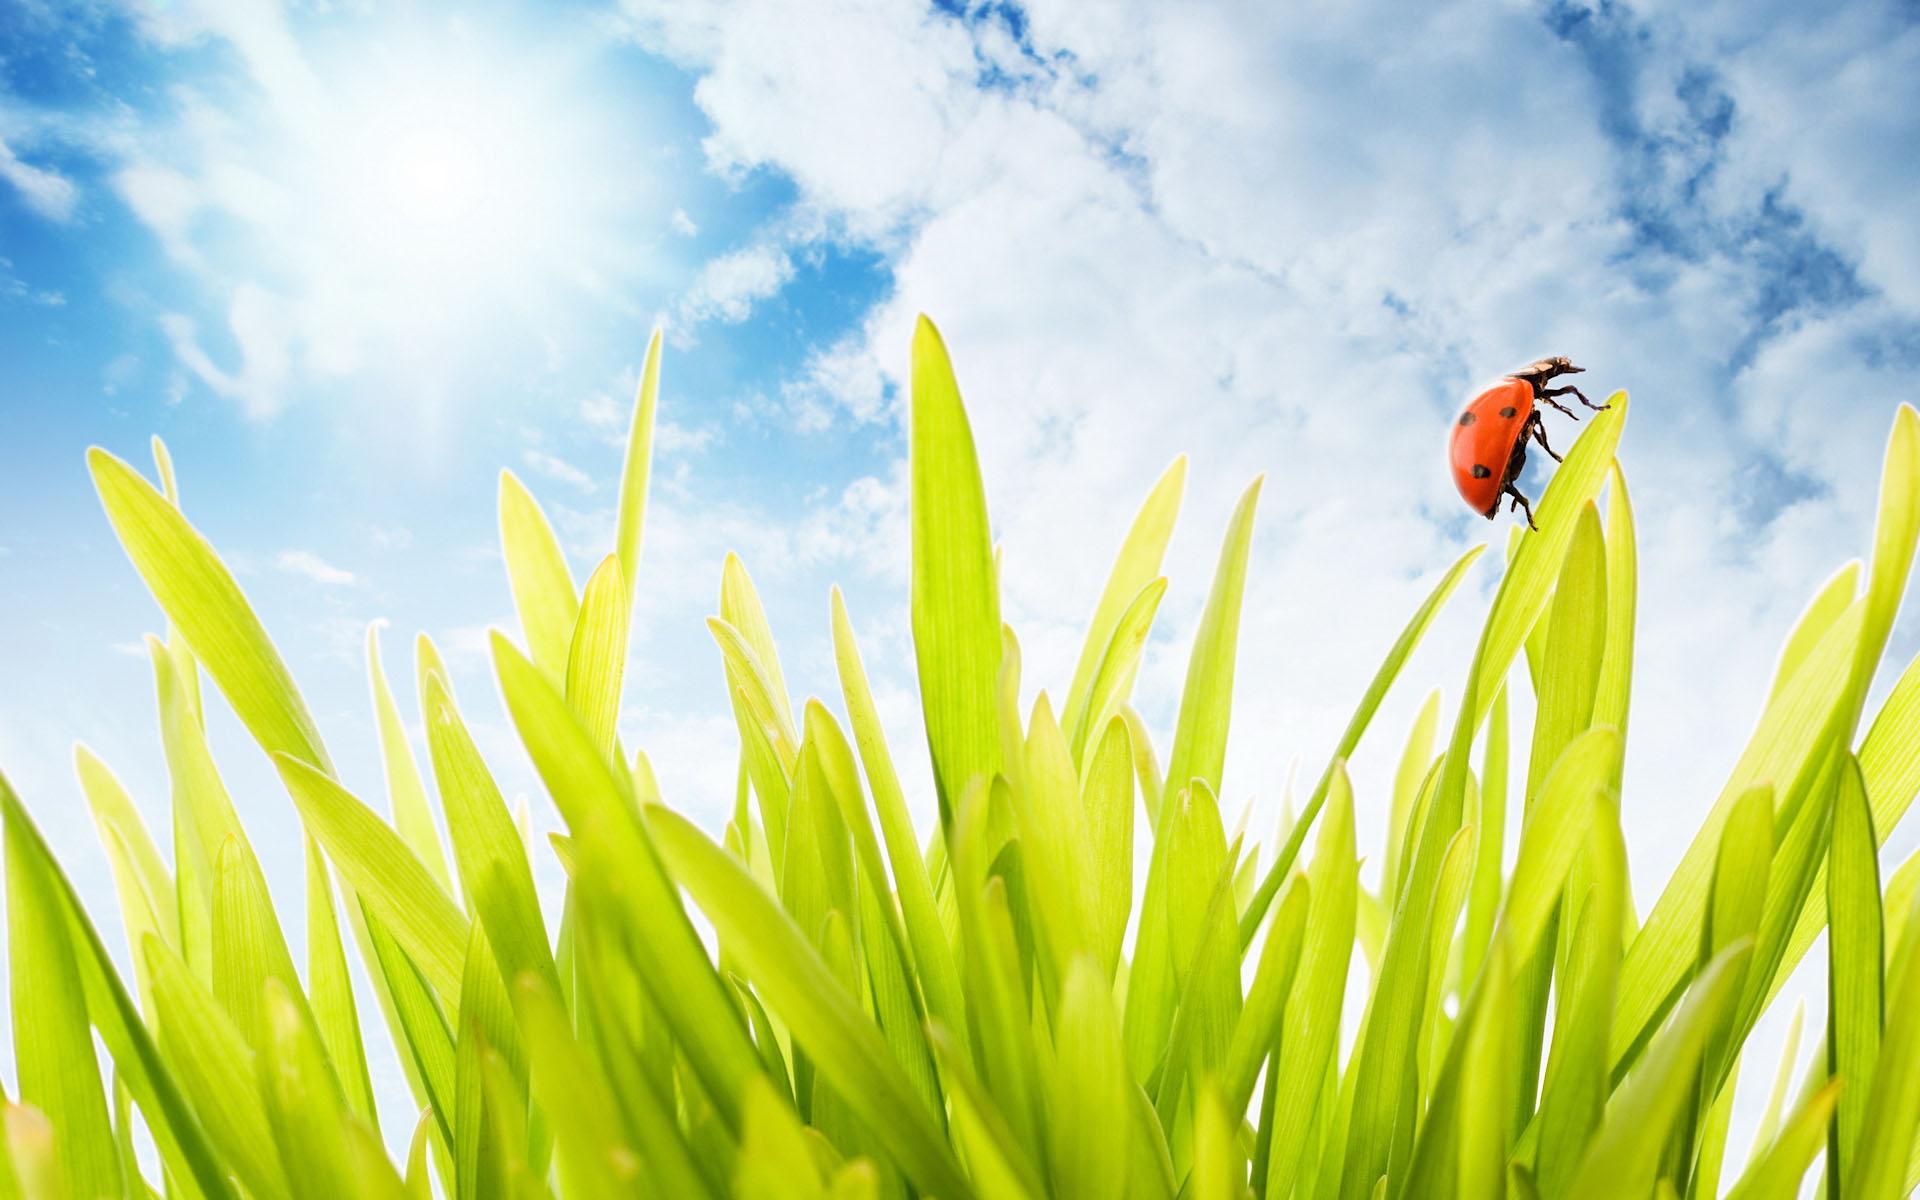 Трава зеленая и небо, обои на рабочий стол